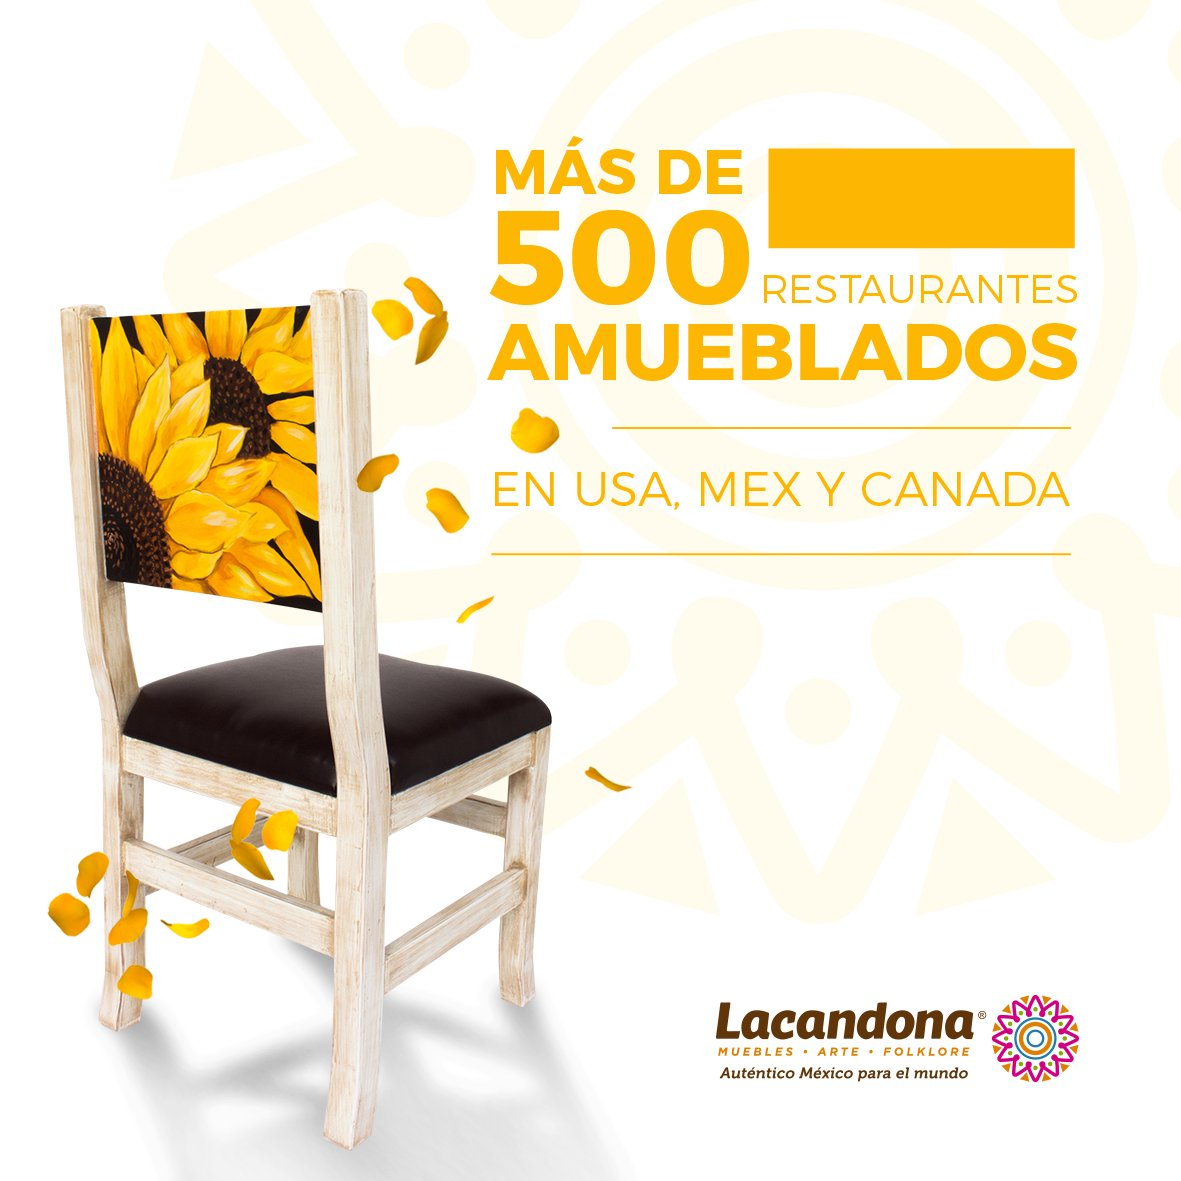 Muebles Lacandona On Twitter Orgullosamente Llevamos A M Xico